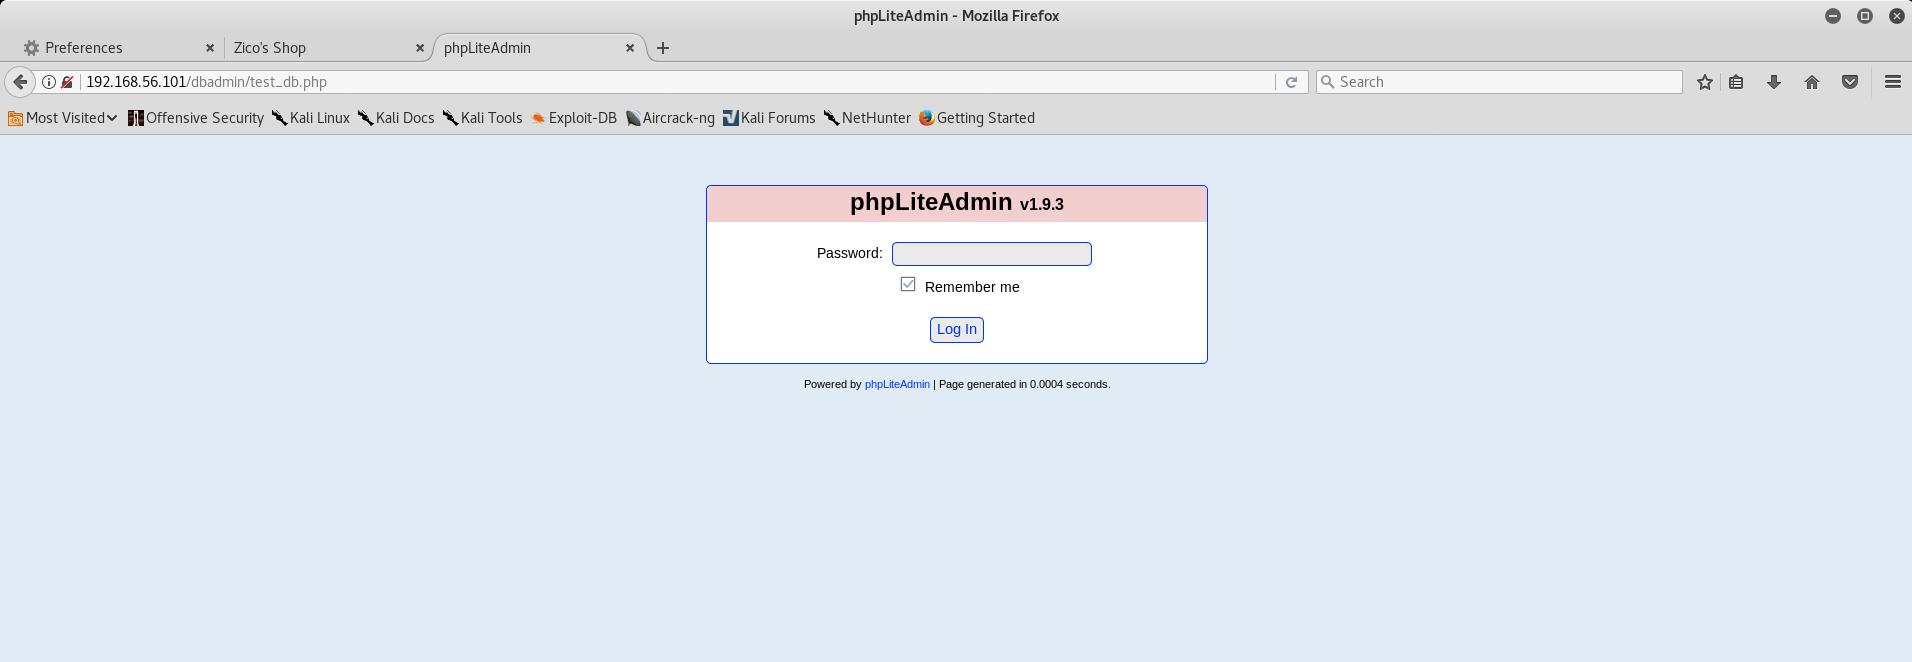 phpLiteAdmin Login page